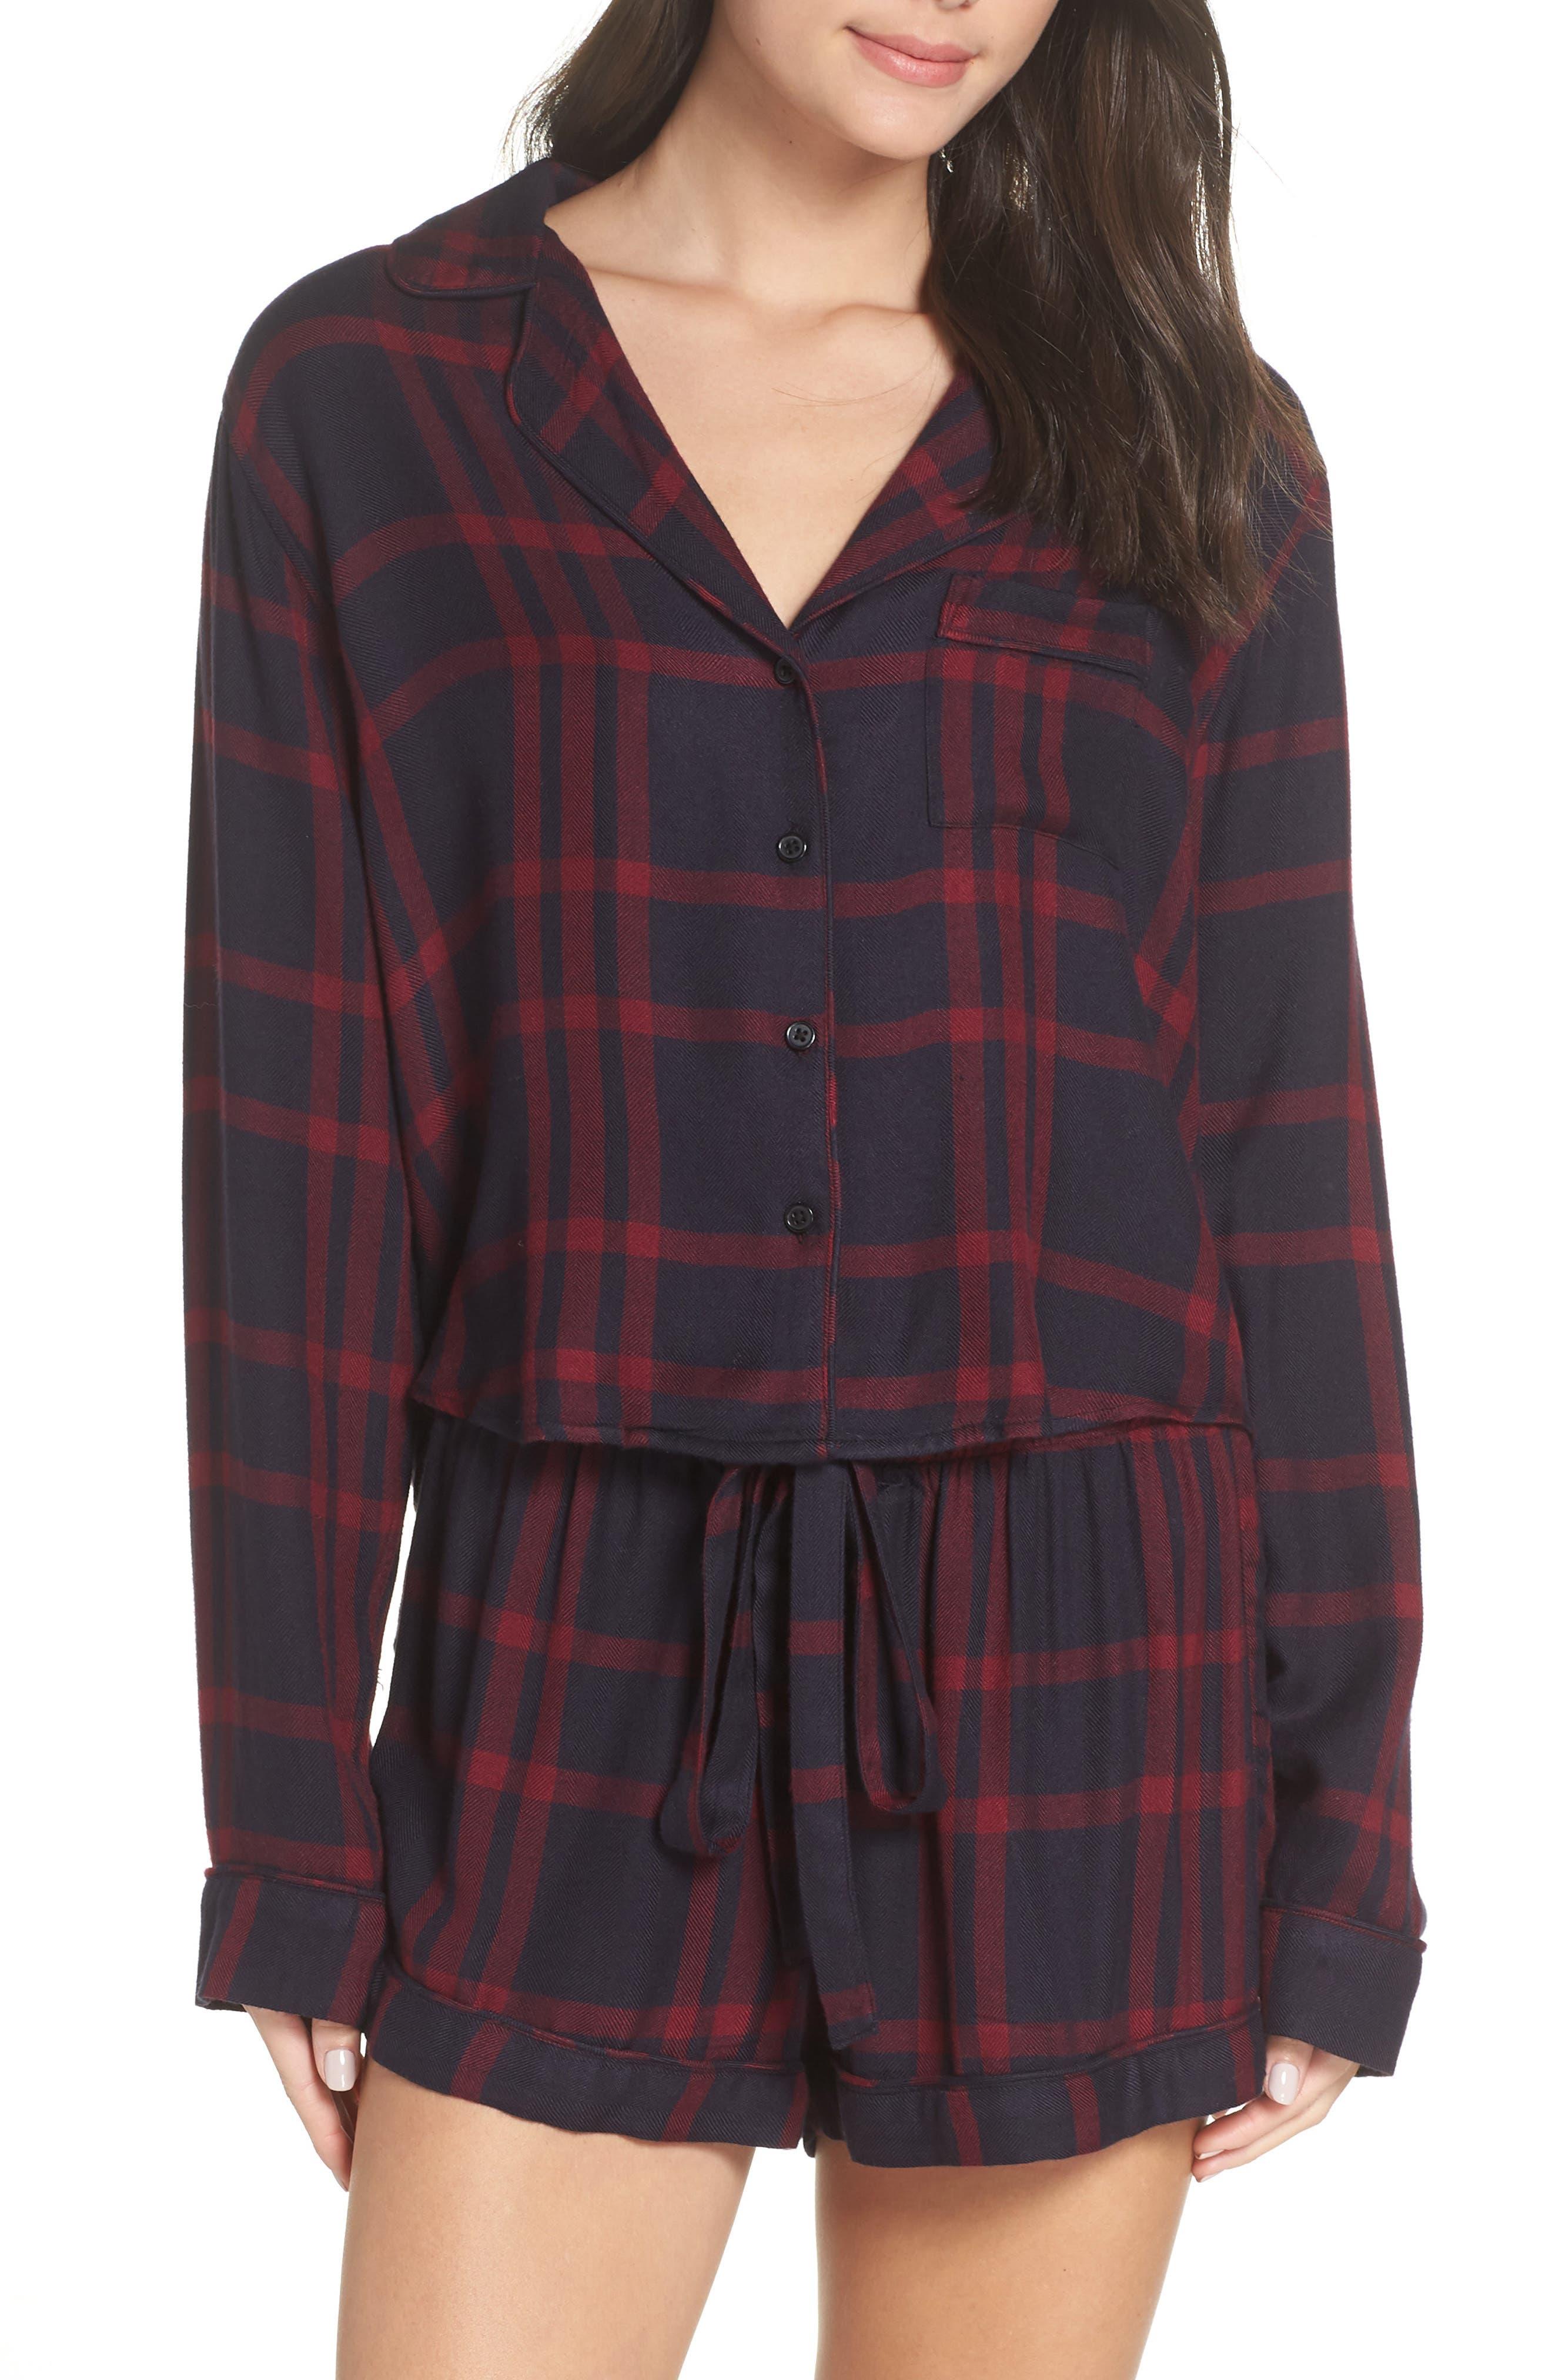 Short Pajamas,                             Main thumbnail 1, color,                             BLACK CHERRY